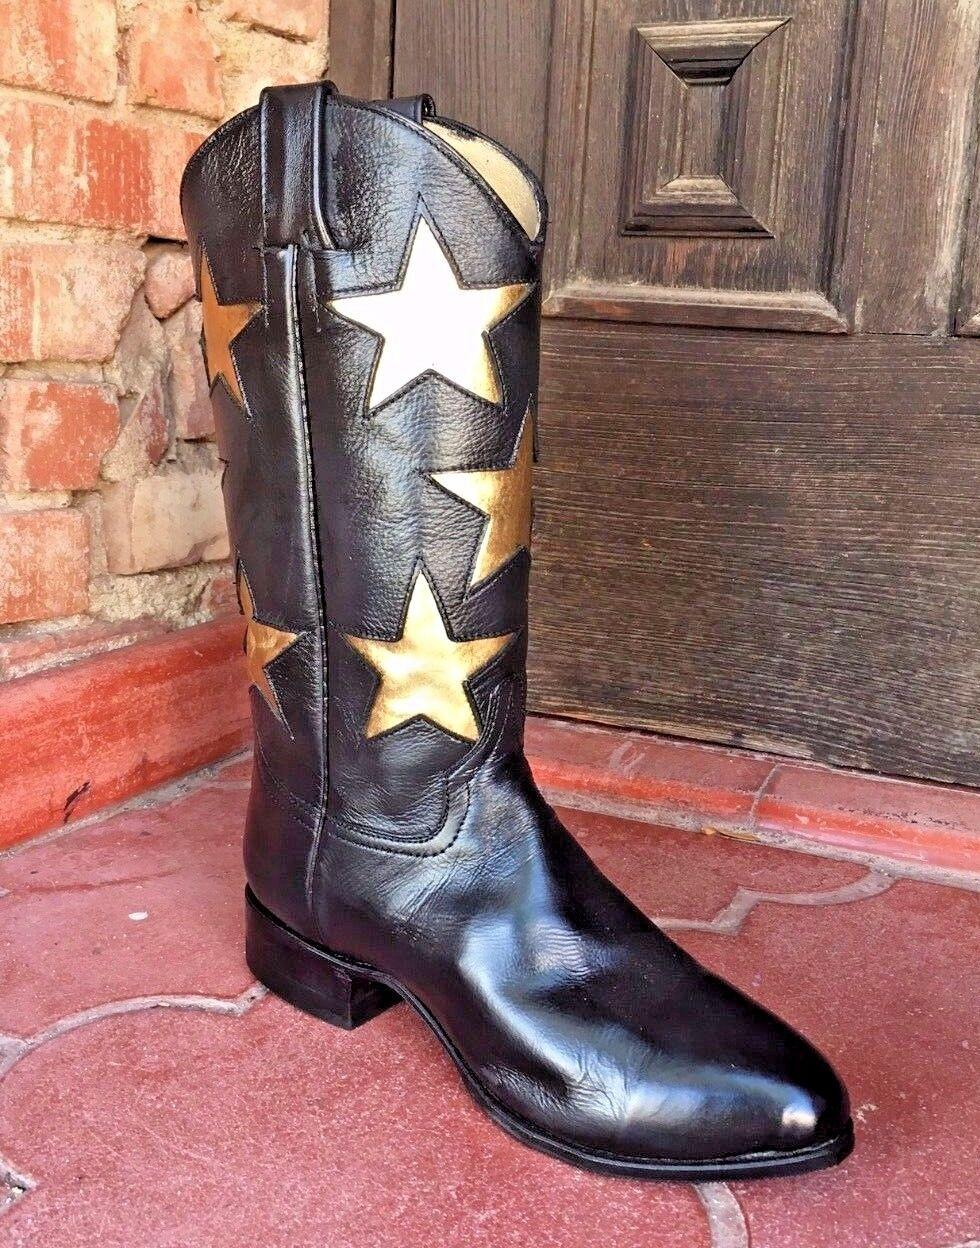 Lot of Black Gold Star Leather Cheerleader dance Cowboy Boots Ladies Flex sole